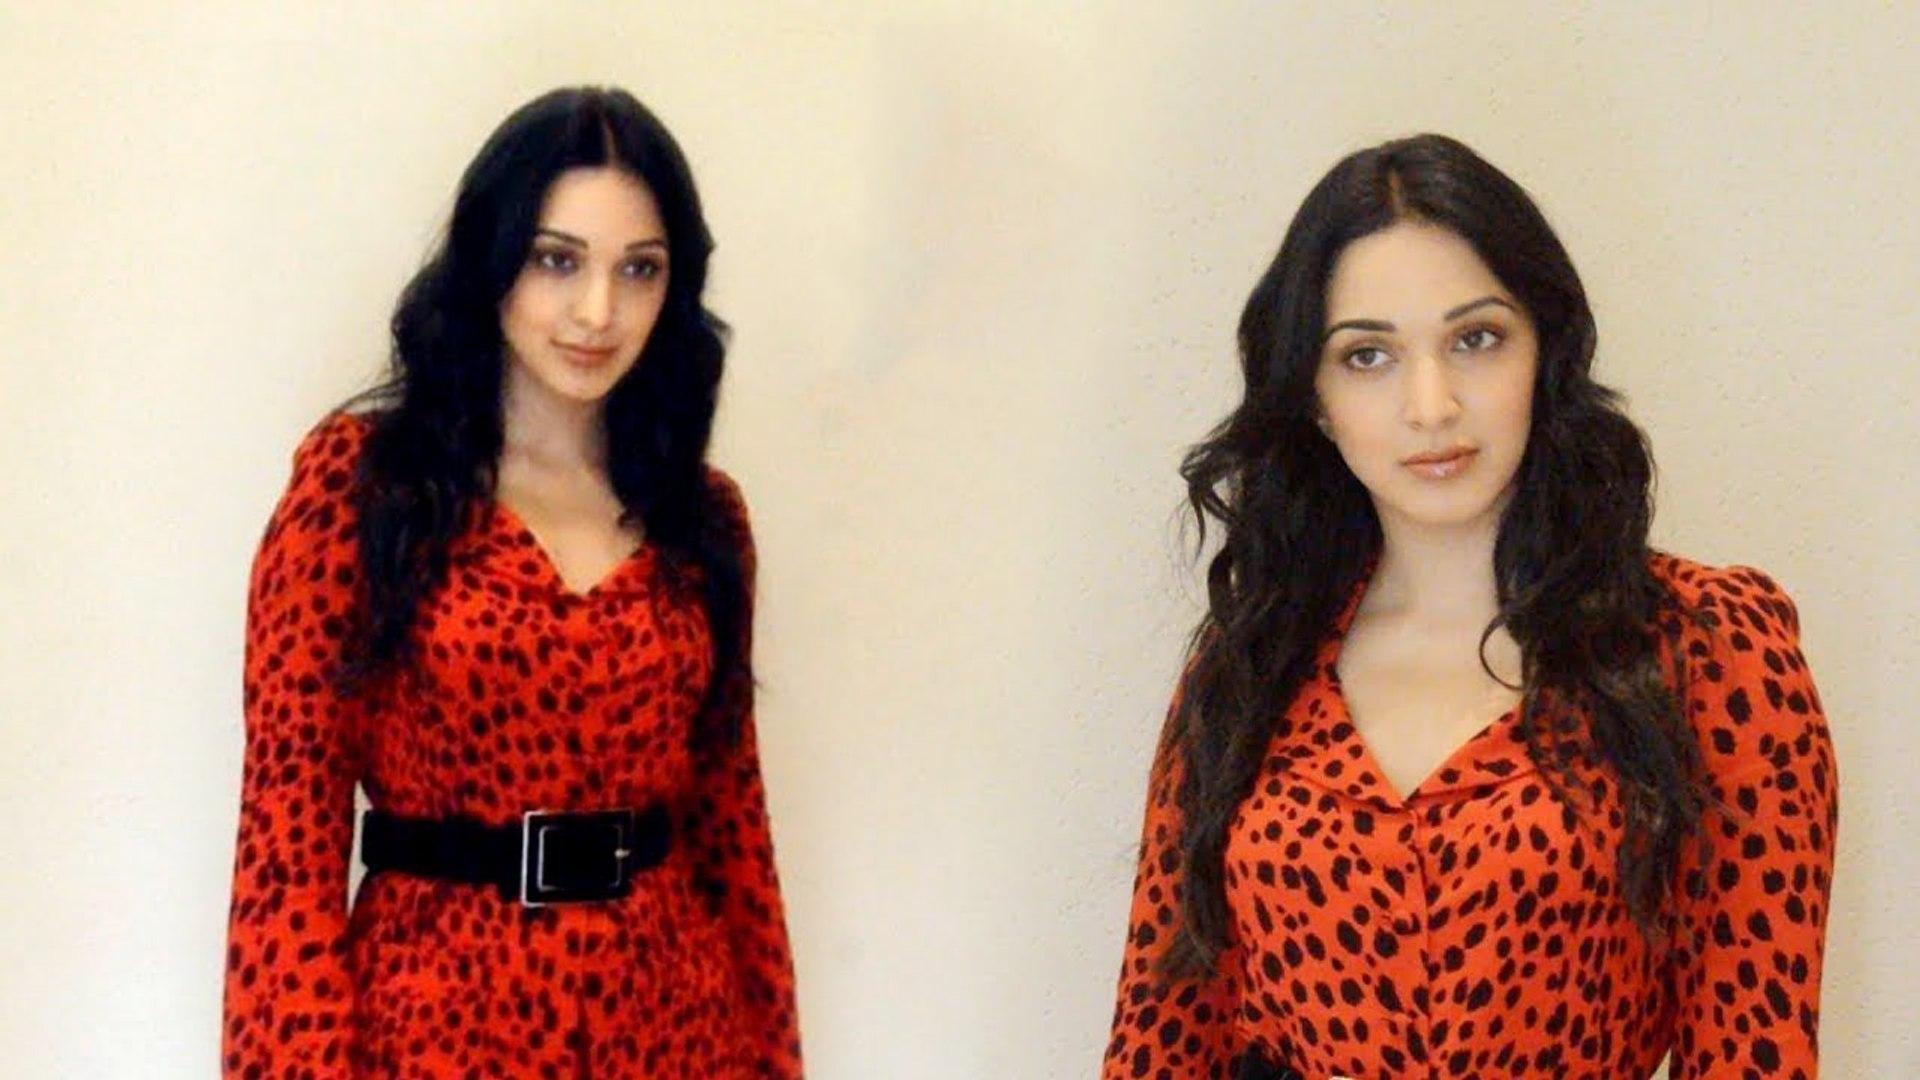 Kabir Singh Actress Kiara Advani Looks Super H0T ARRIVED At For Movie Promotion Kabir Singh